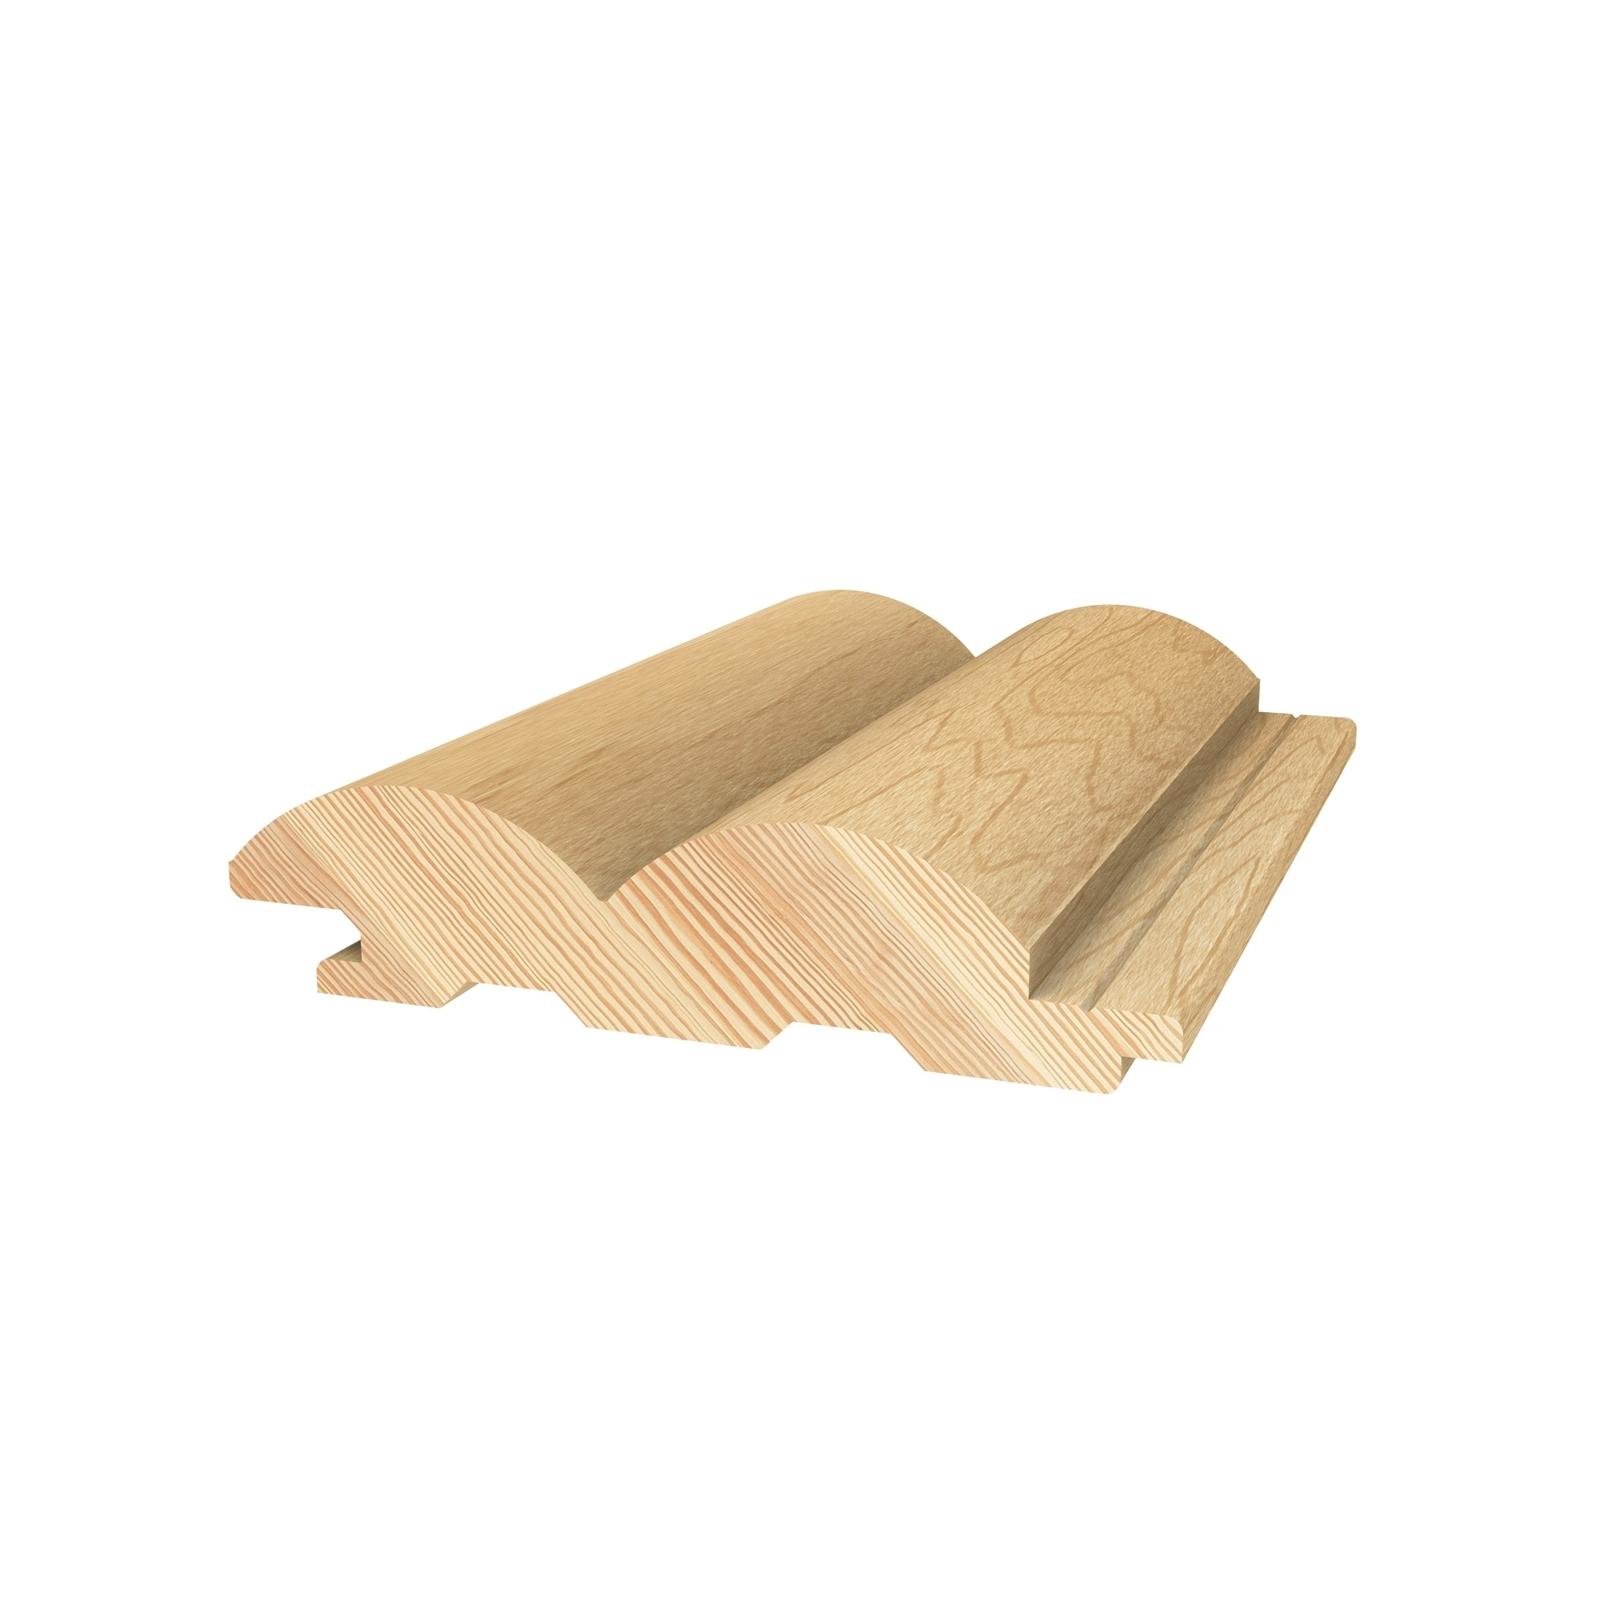 Porta Contours 78 x 21mm 1.8m Riverine Clear Pine Lining Board